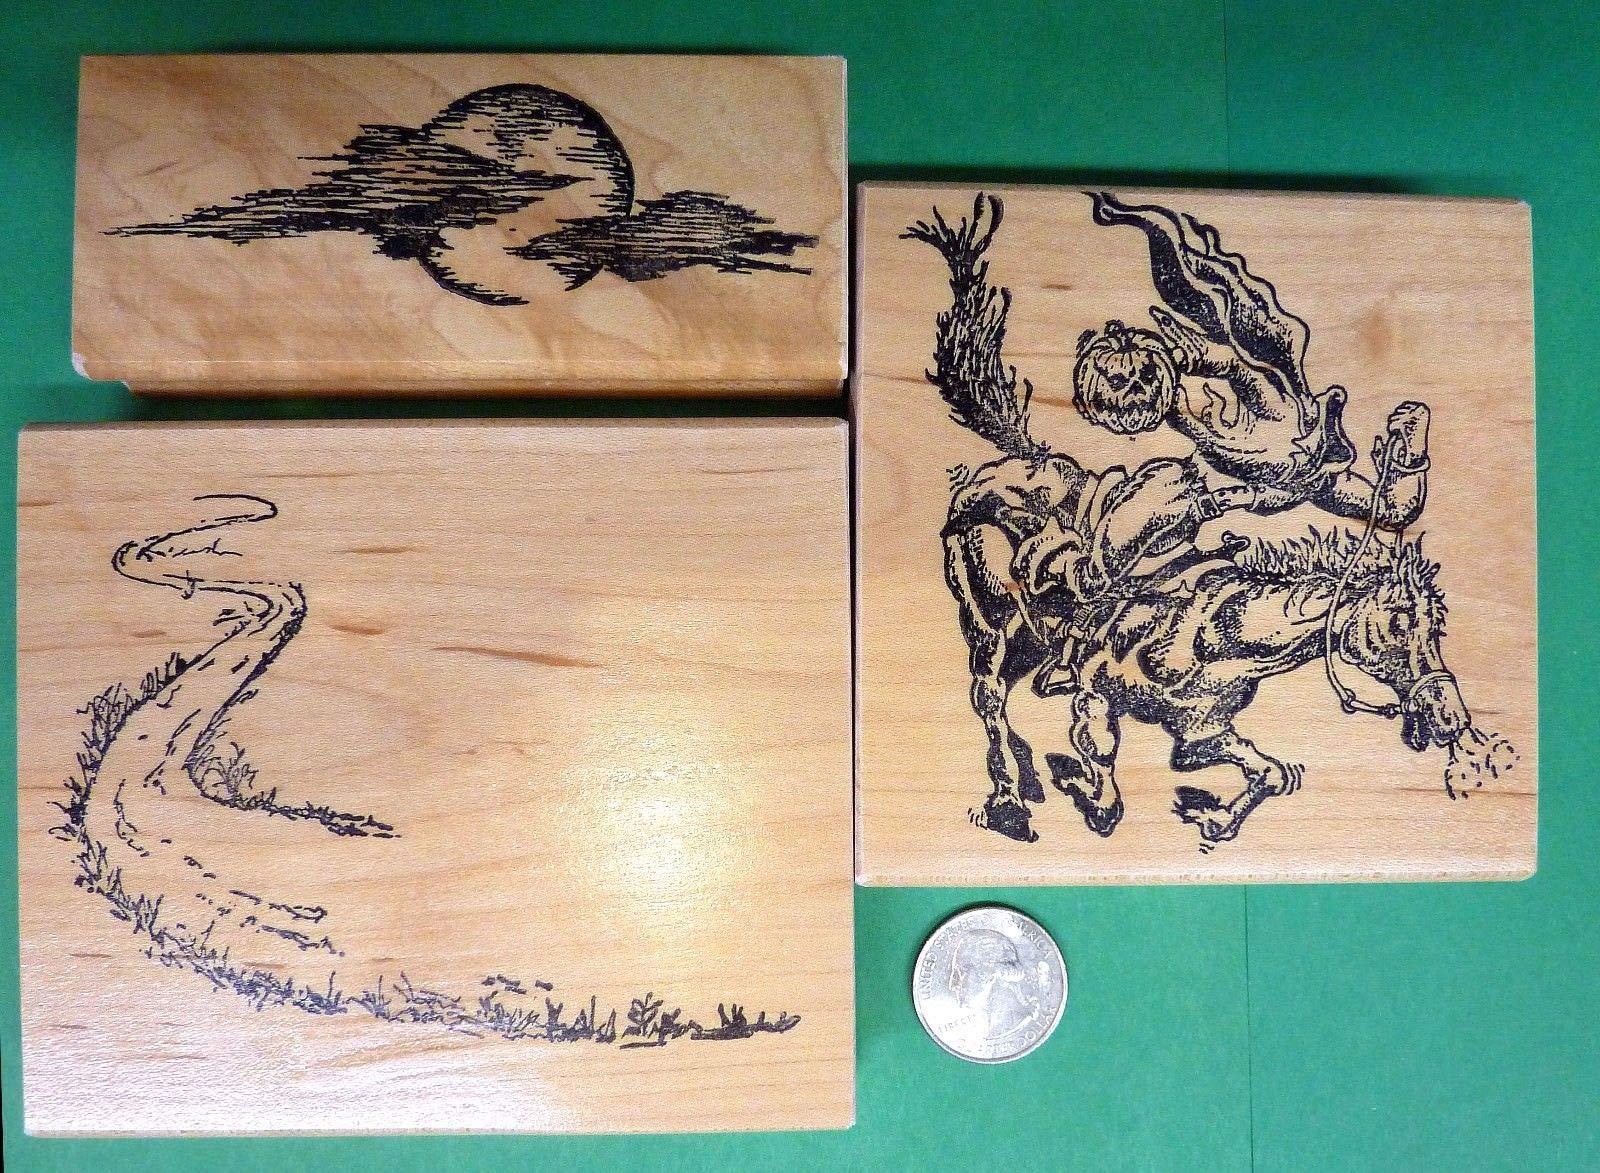 Headless Horseman Wood Mounted Rubber Stamp Set of 3 Pieces, Halloween